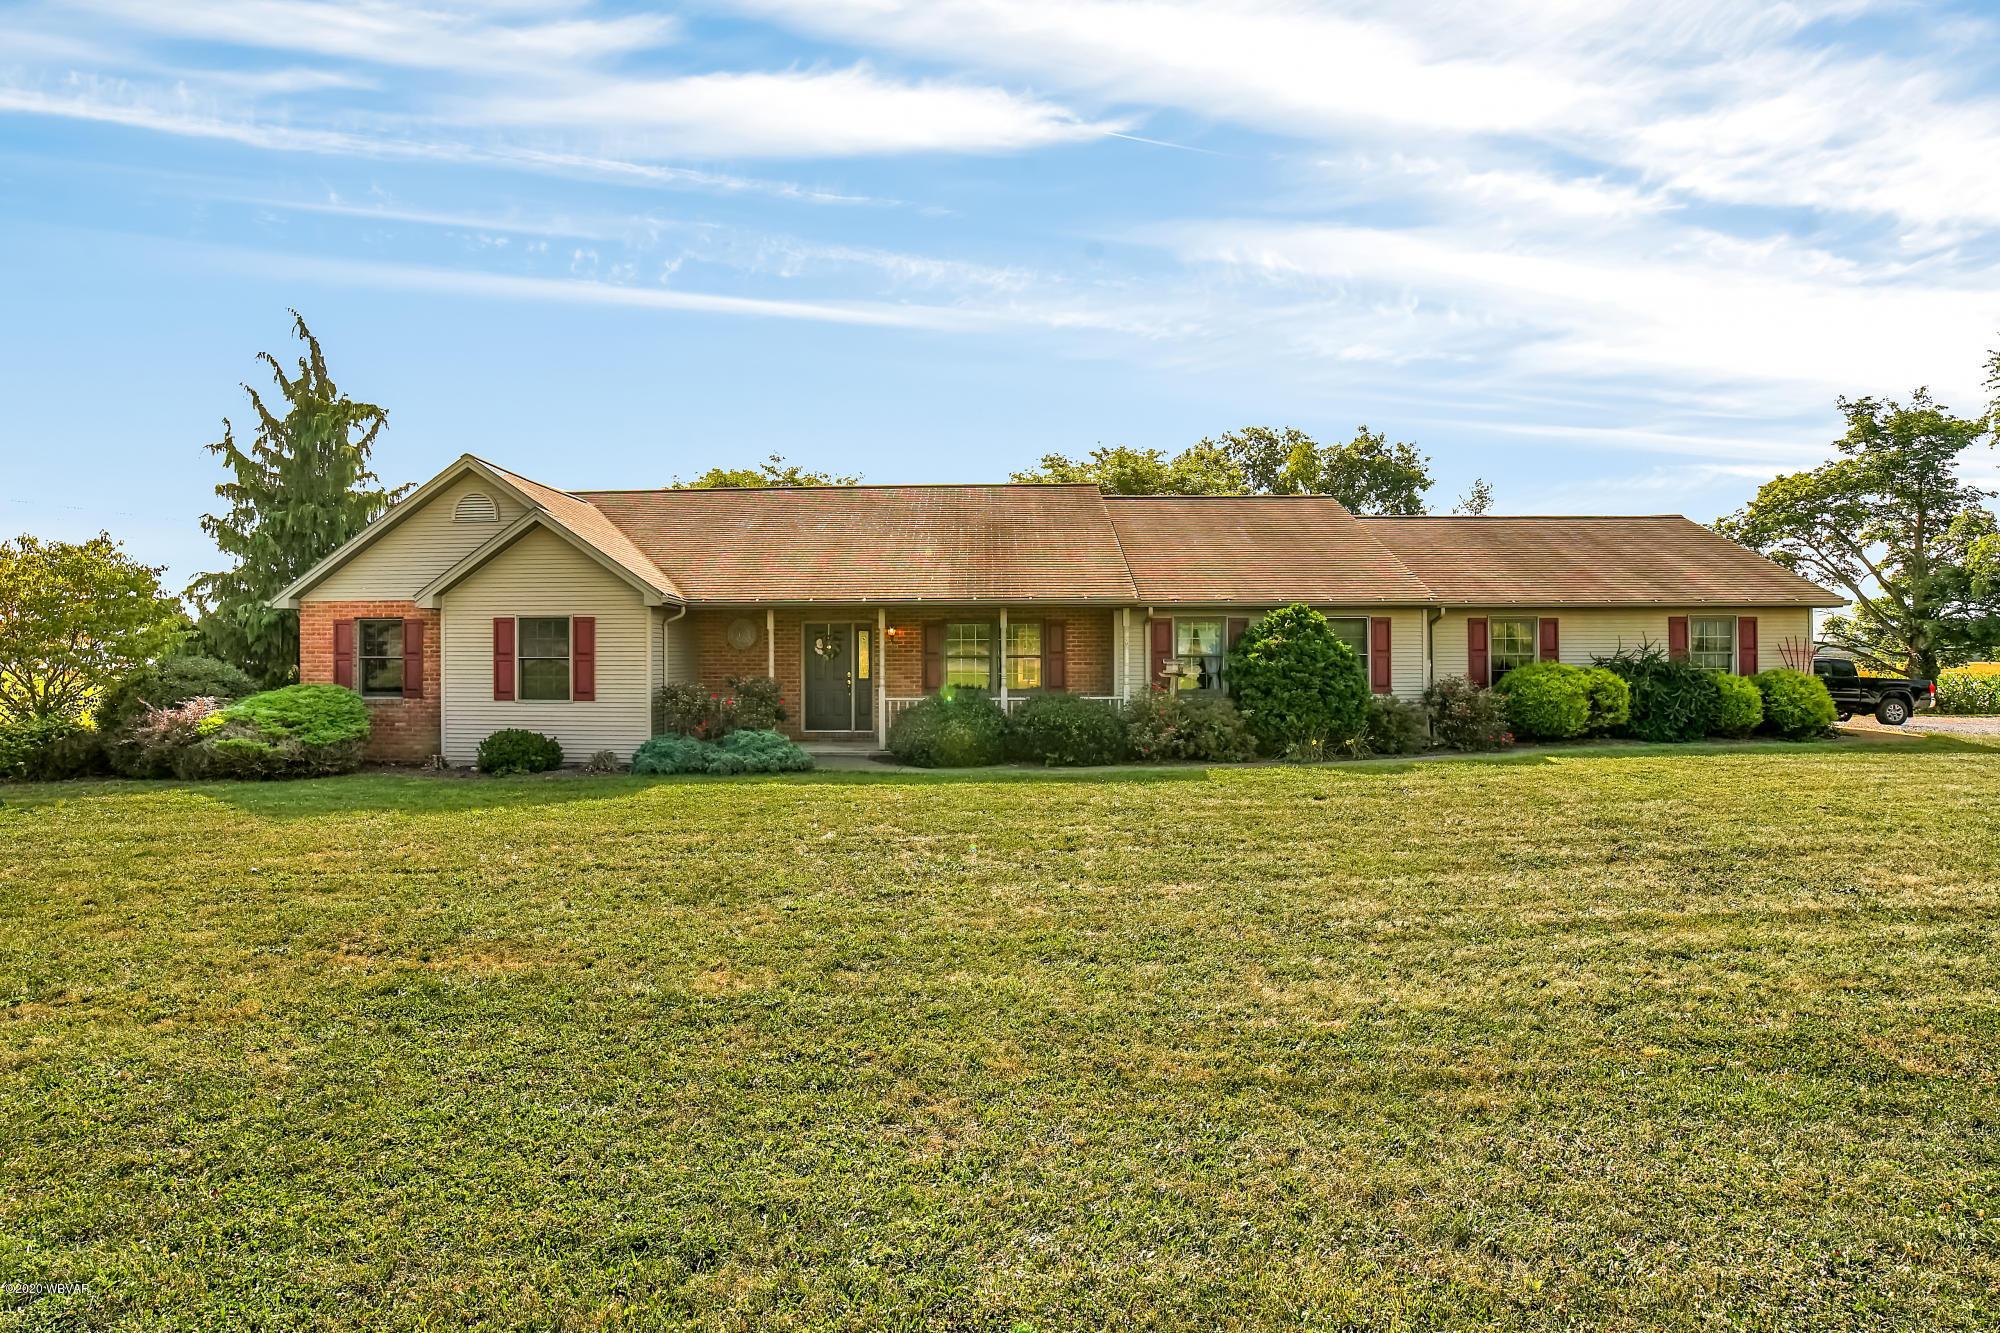 2291 RIDGE ROAD, Montgomery, PA 17752, 5 Bedrooms Bedrooms, ,3.5 BathroomsBathrooms,Residential,For sale,RIDGE,WB-90963